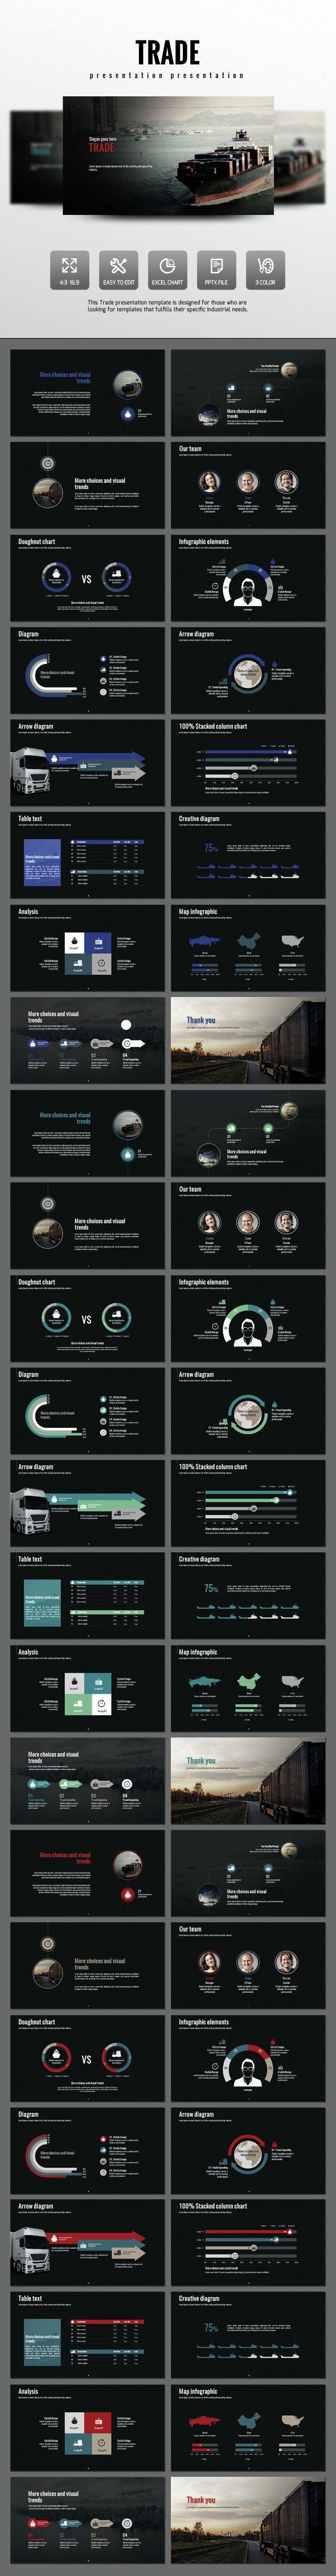 Trade PowerPoint Template #slides Download: http://graphicriver.net/item/trade/14528406?ref=ksioks